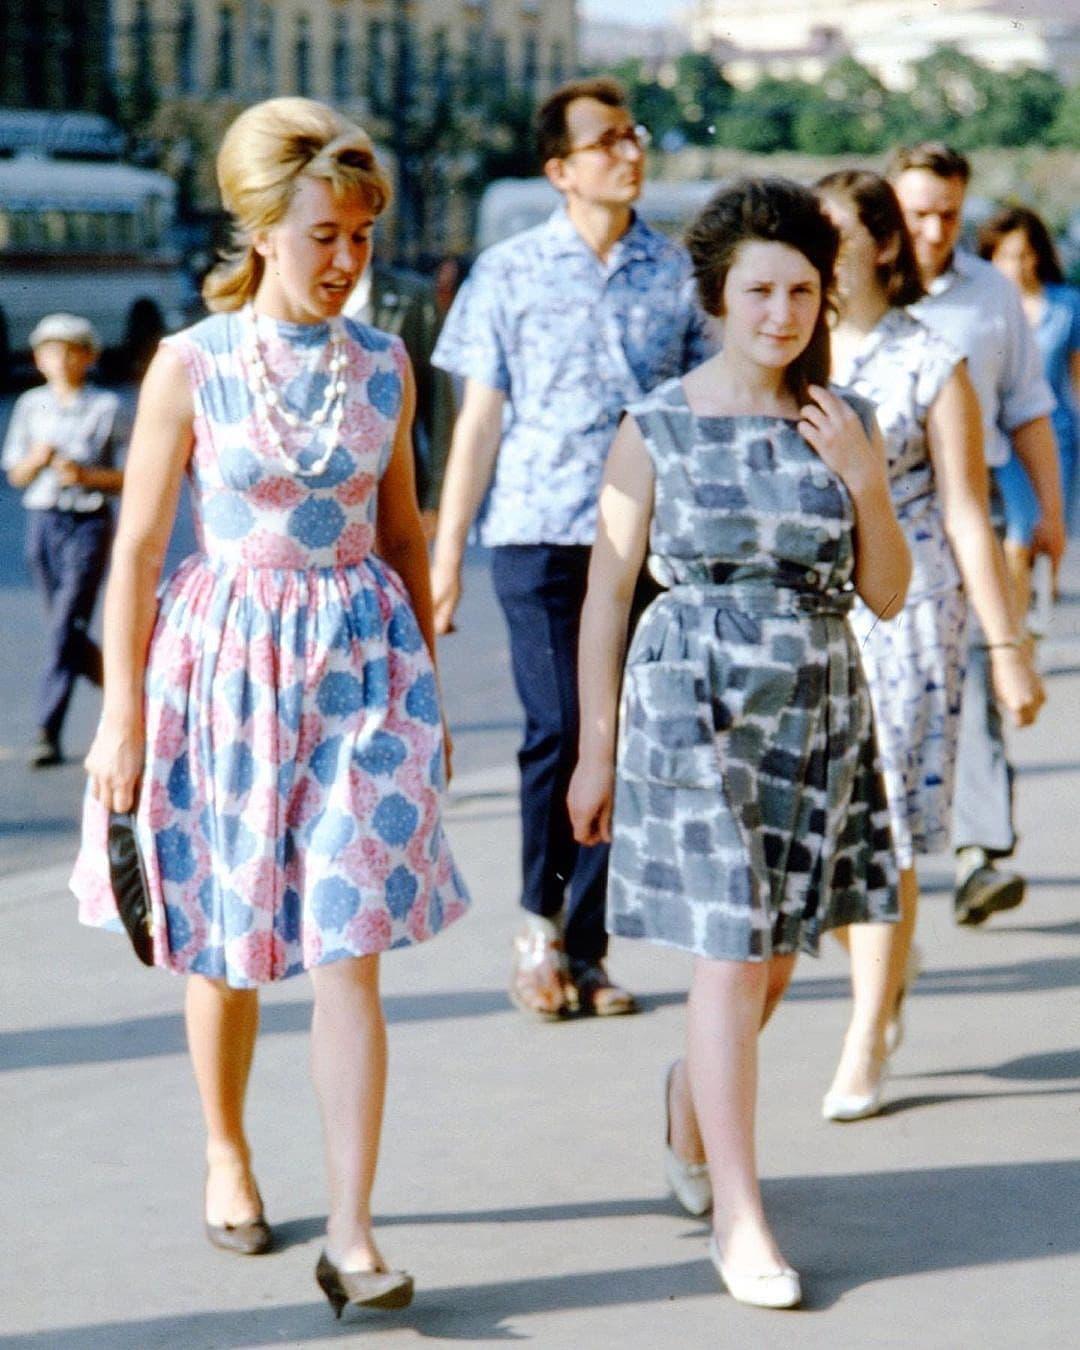 Необыкновенно тёплая атмосфера Москвы в начале 60-х